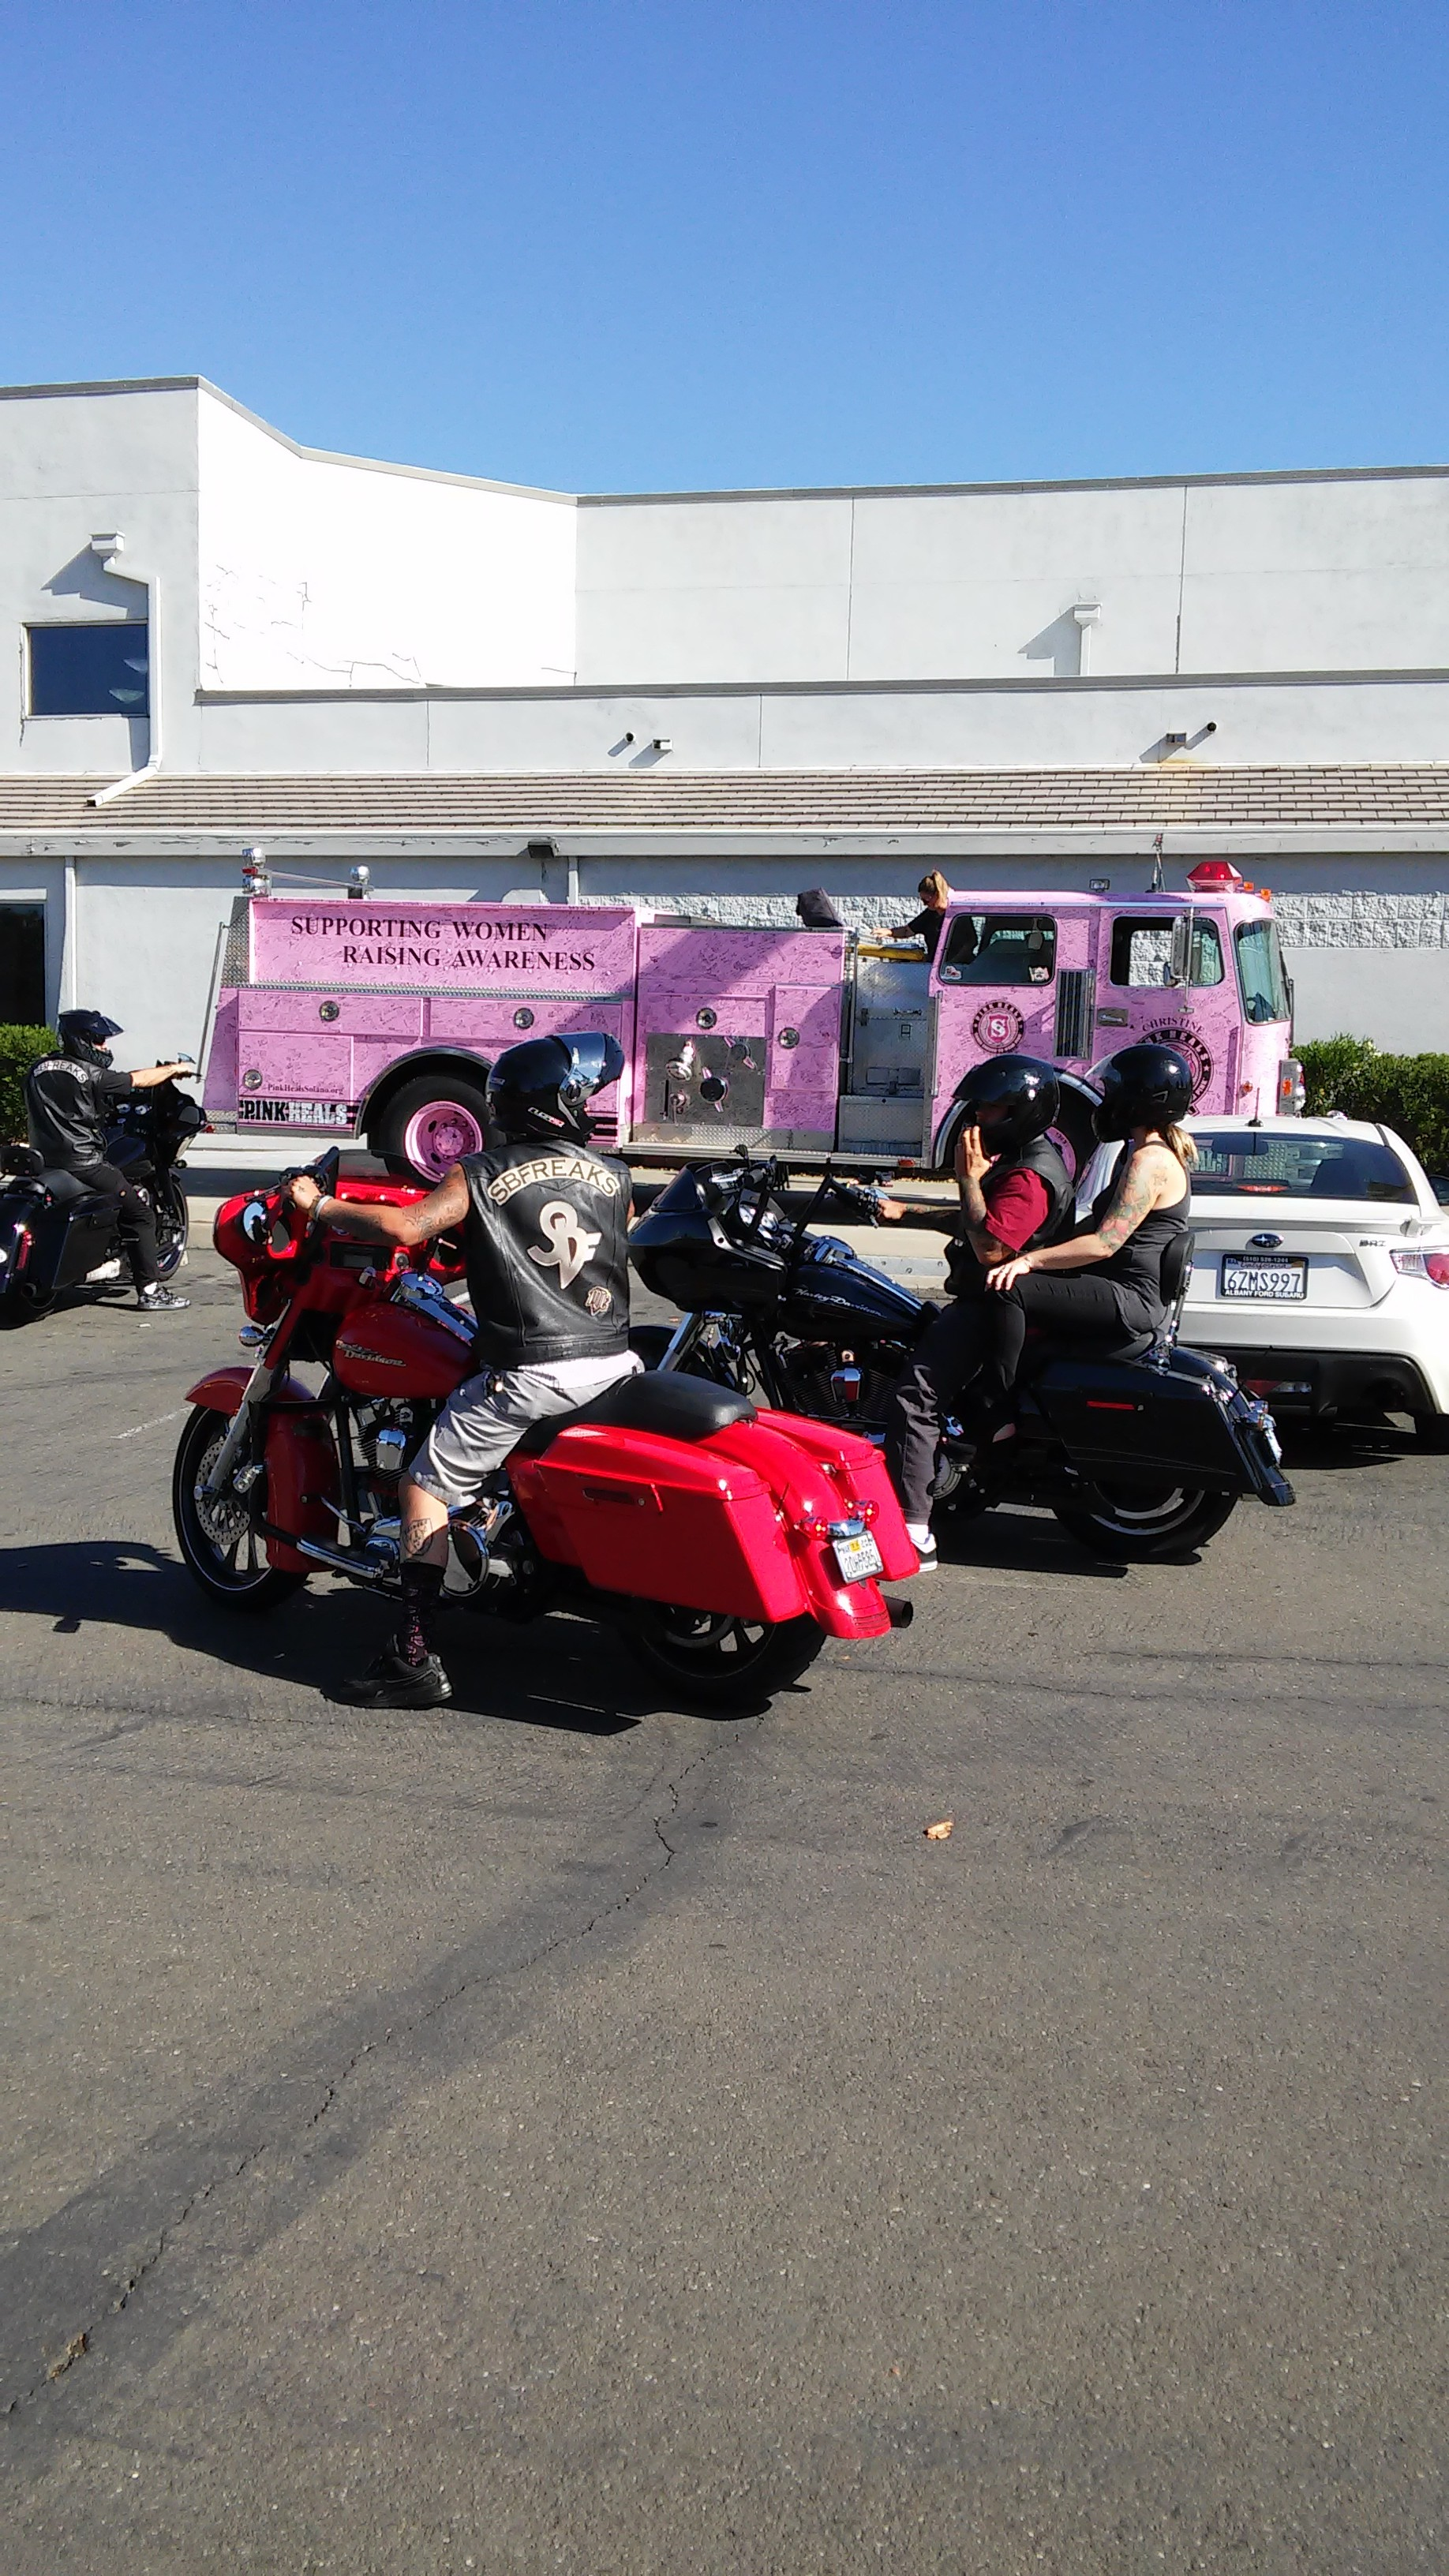 Iron Steed Harley Davidson, Vacaville, CA